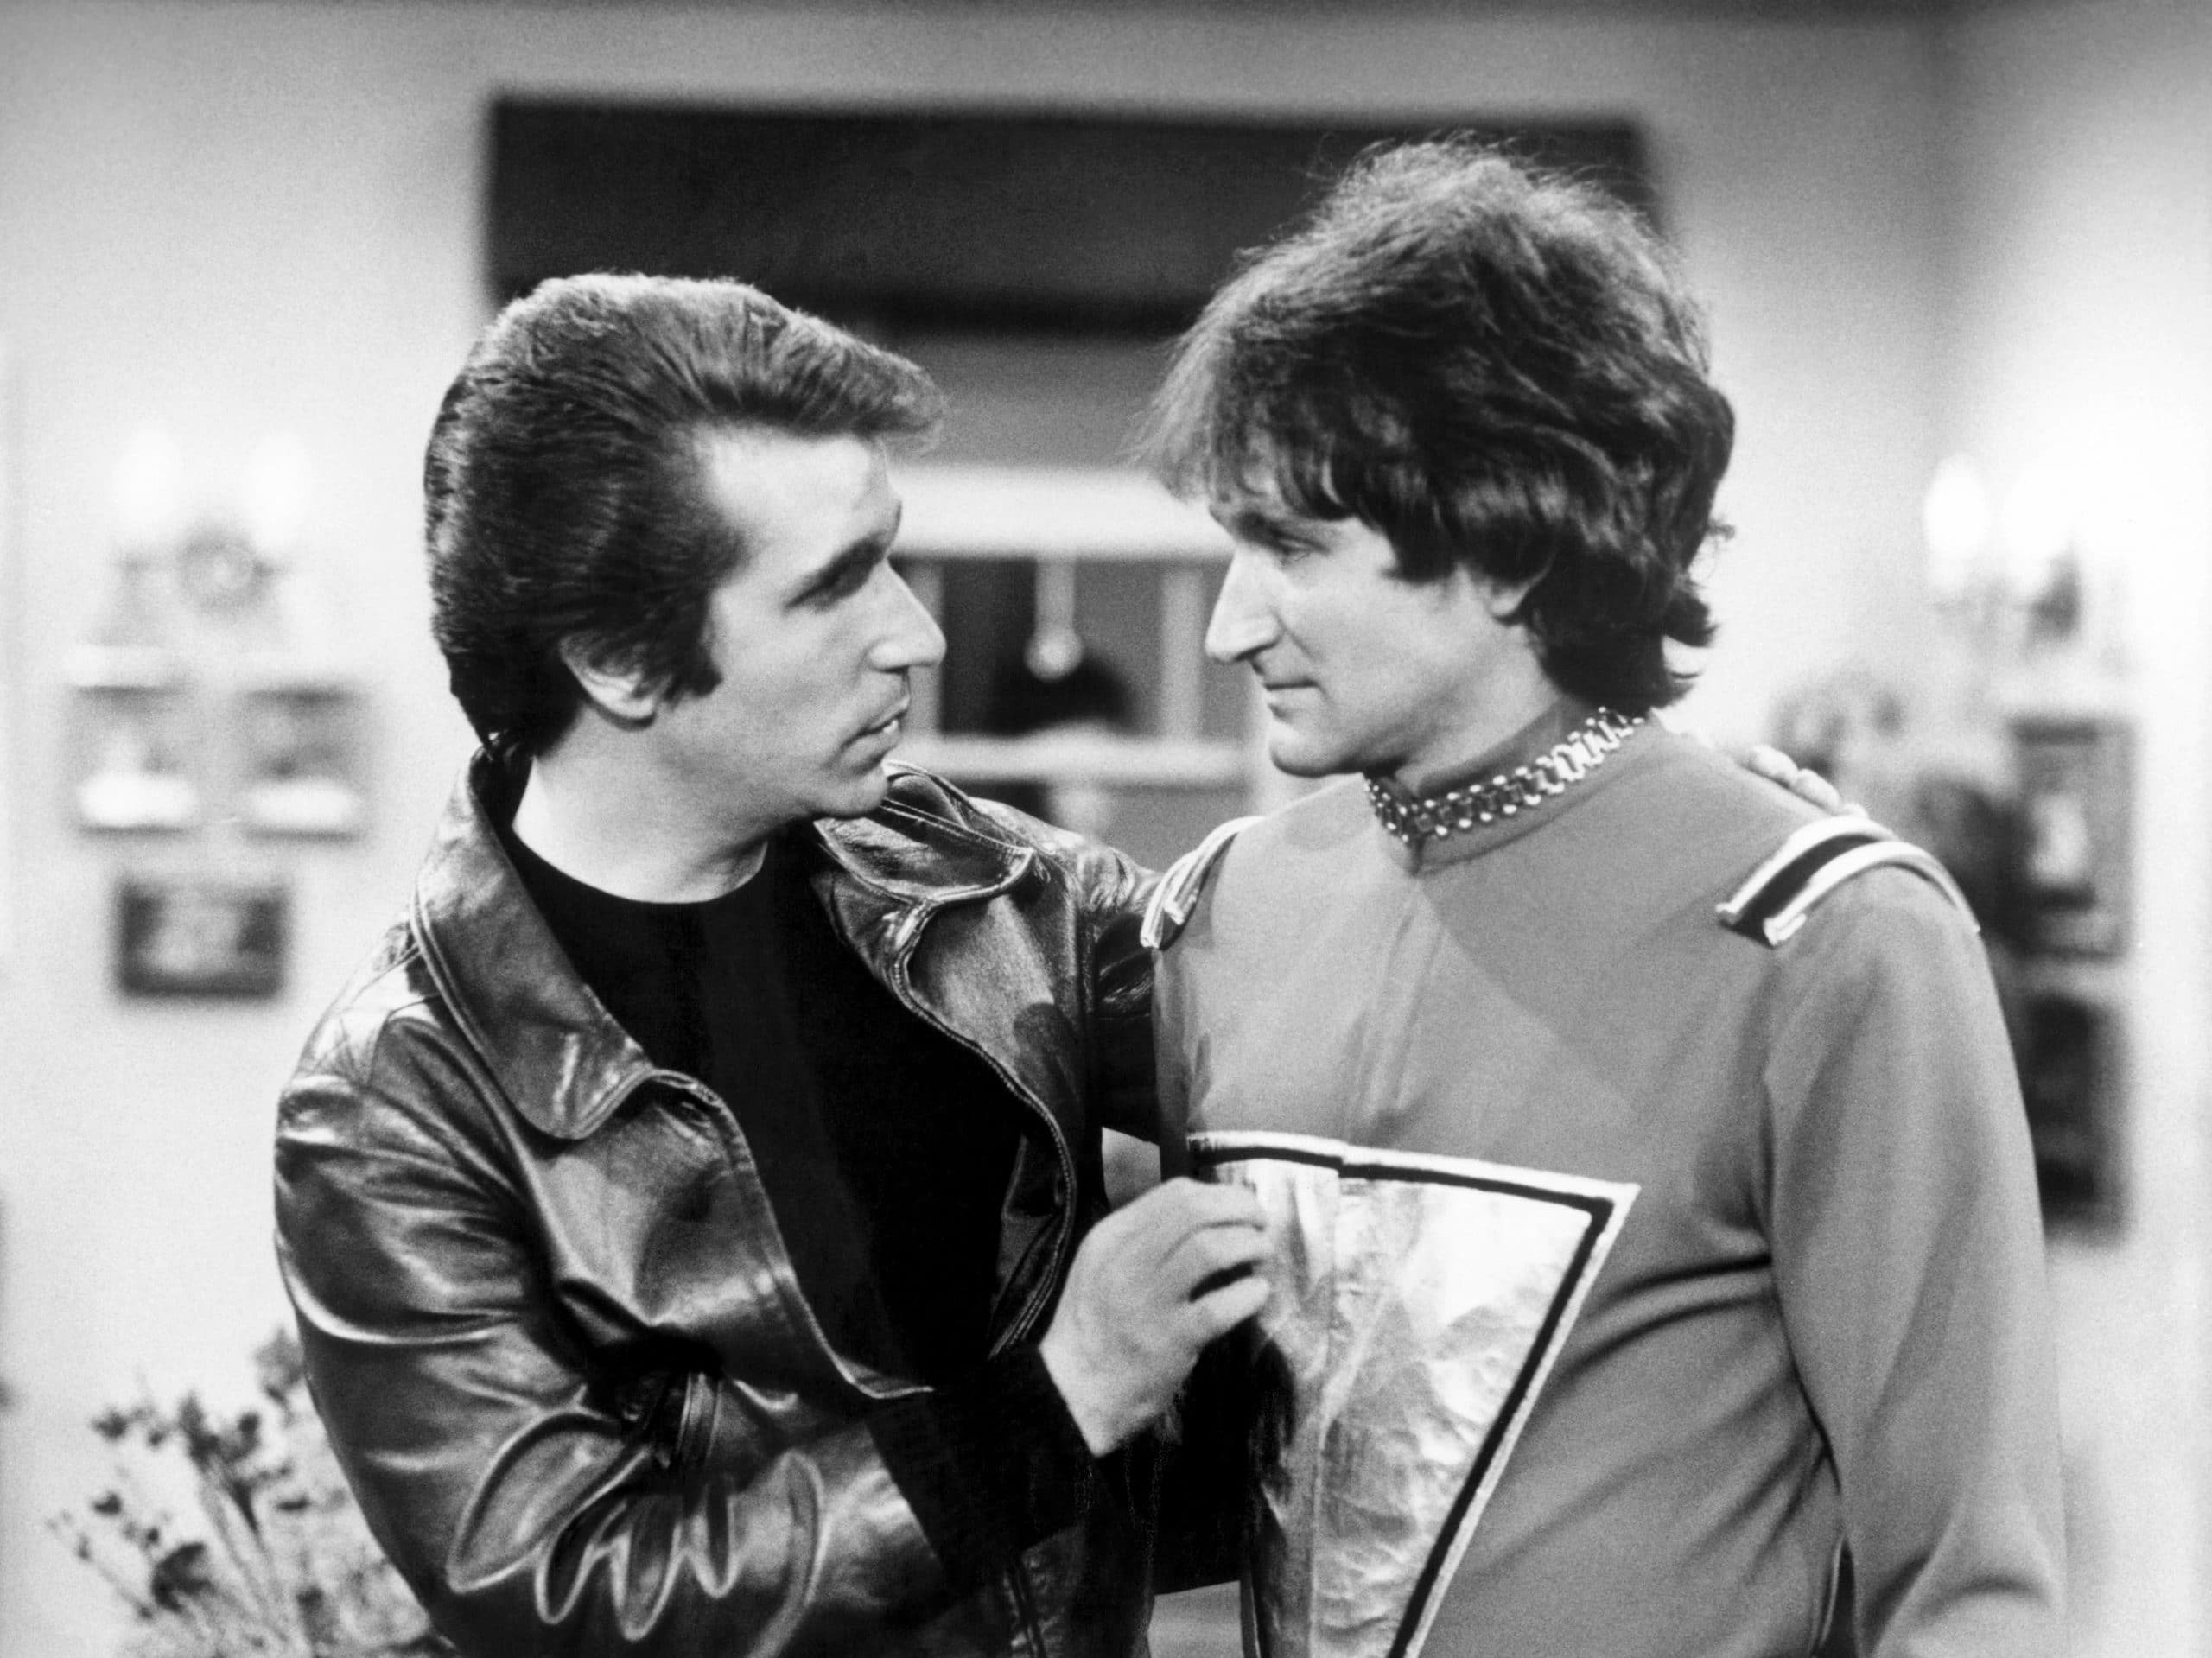 MORK AND MINDY, Henry Winkler, Robin Williams, 'Pilot'